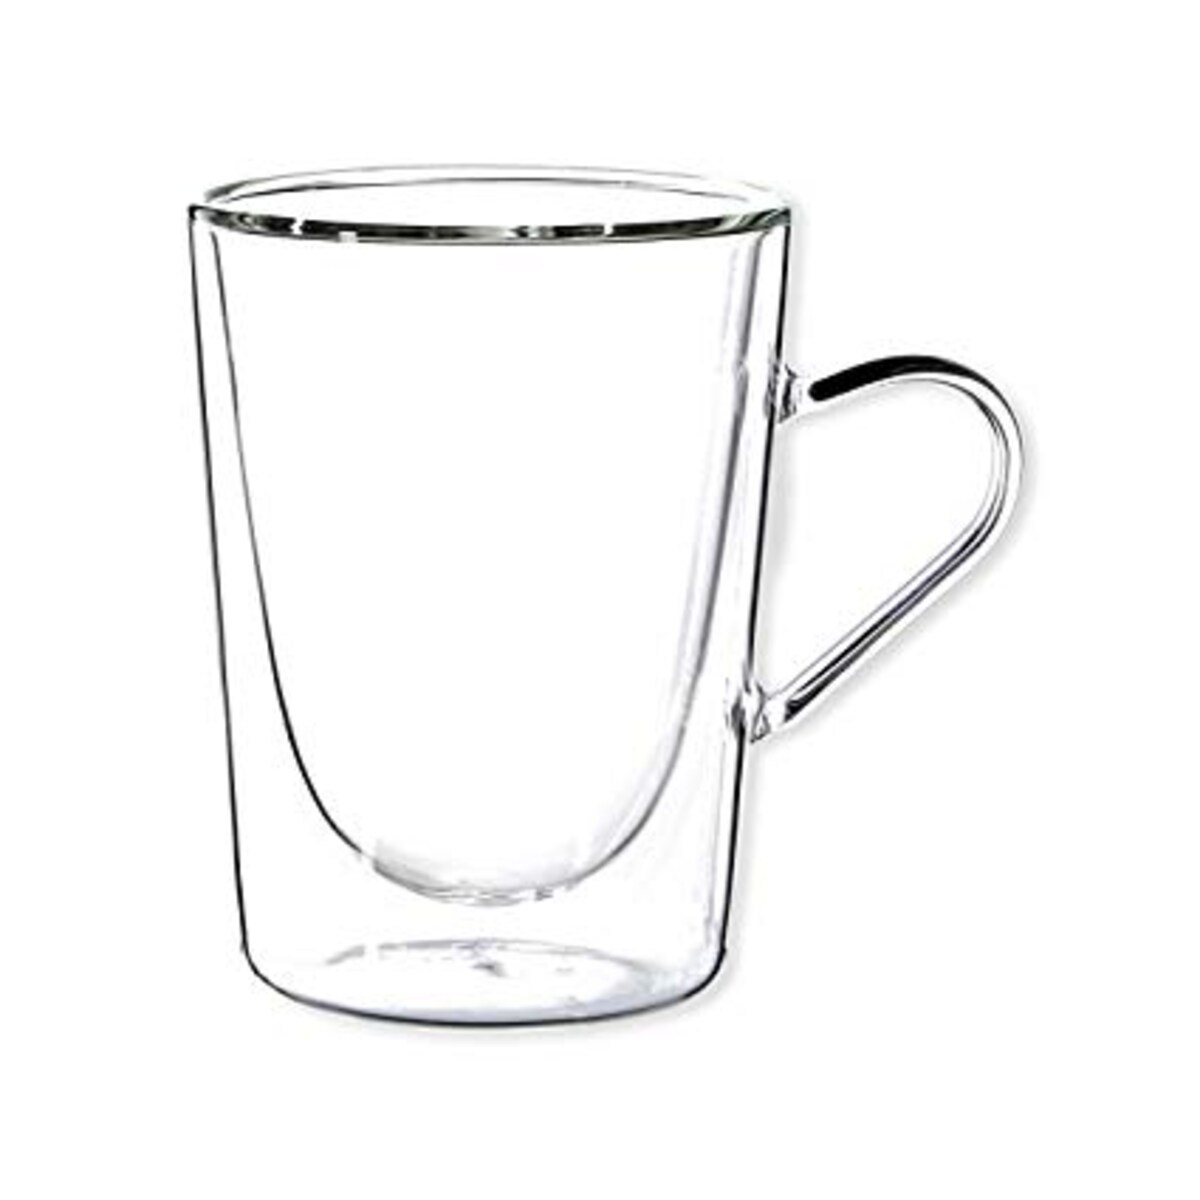 Luigi Bormioli Tea Mug 2 двустенни чаши - 295мл